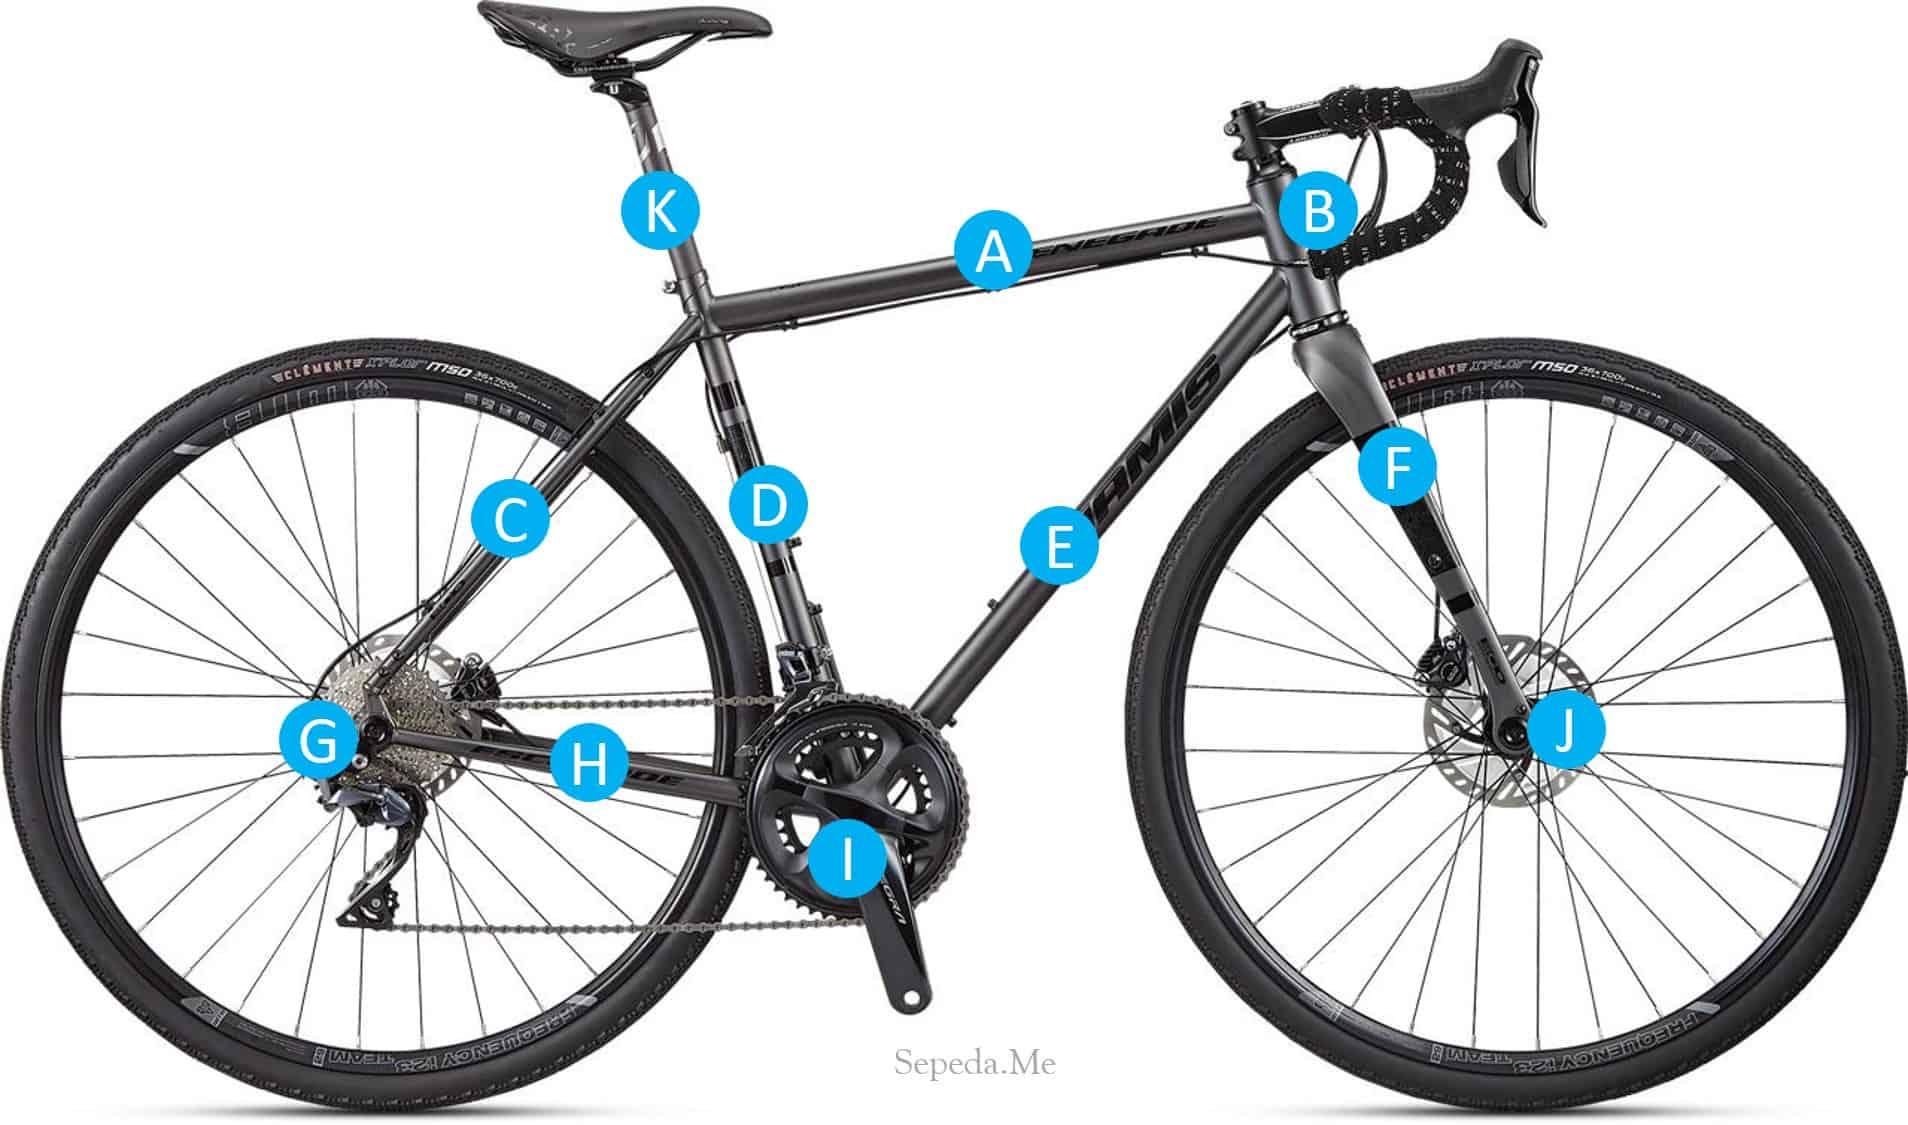 Dimensi geometri frame sepeda - Sepeda.Me